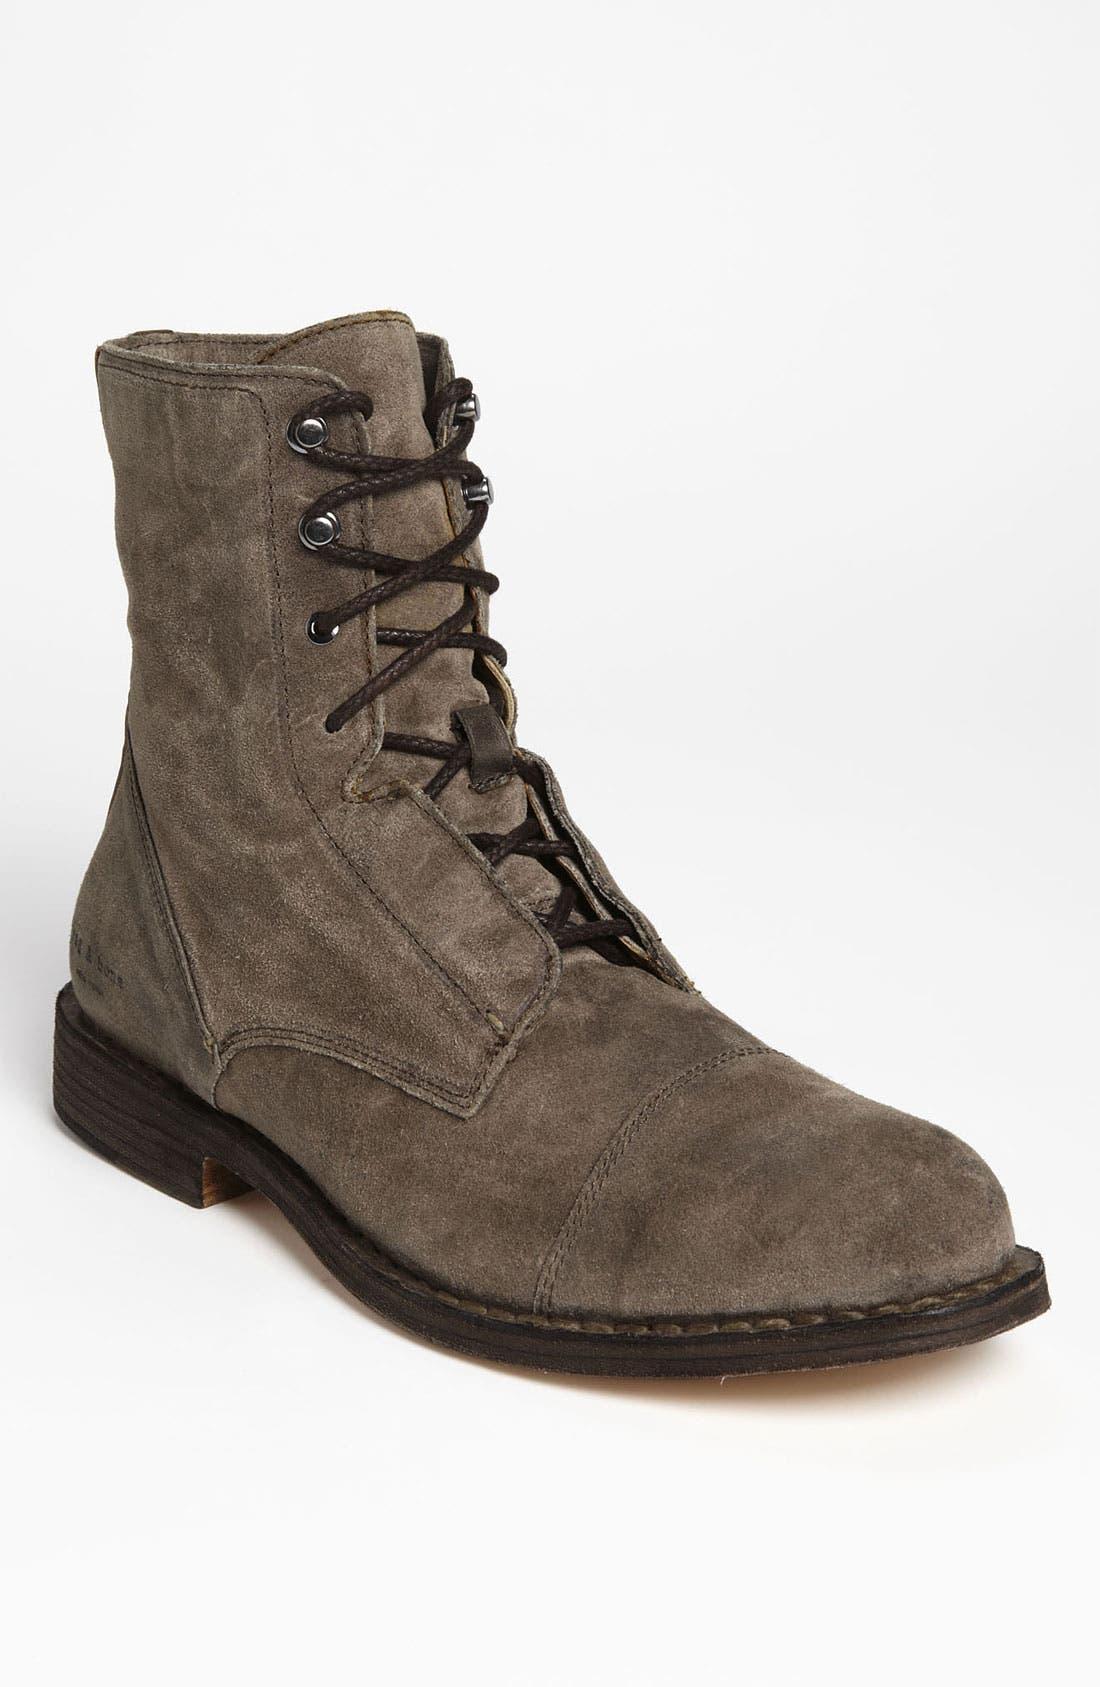 Alternate Image 1 Selected - rag & bone 'Mallory' Boot